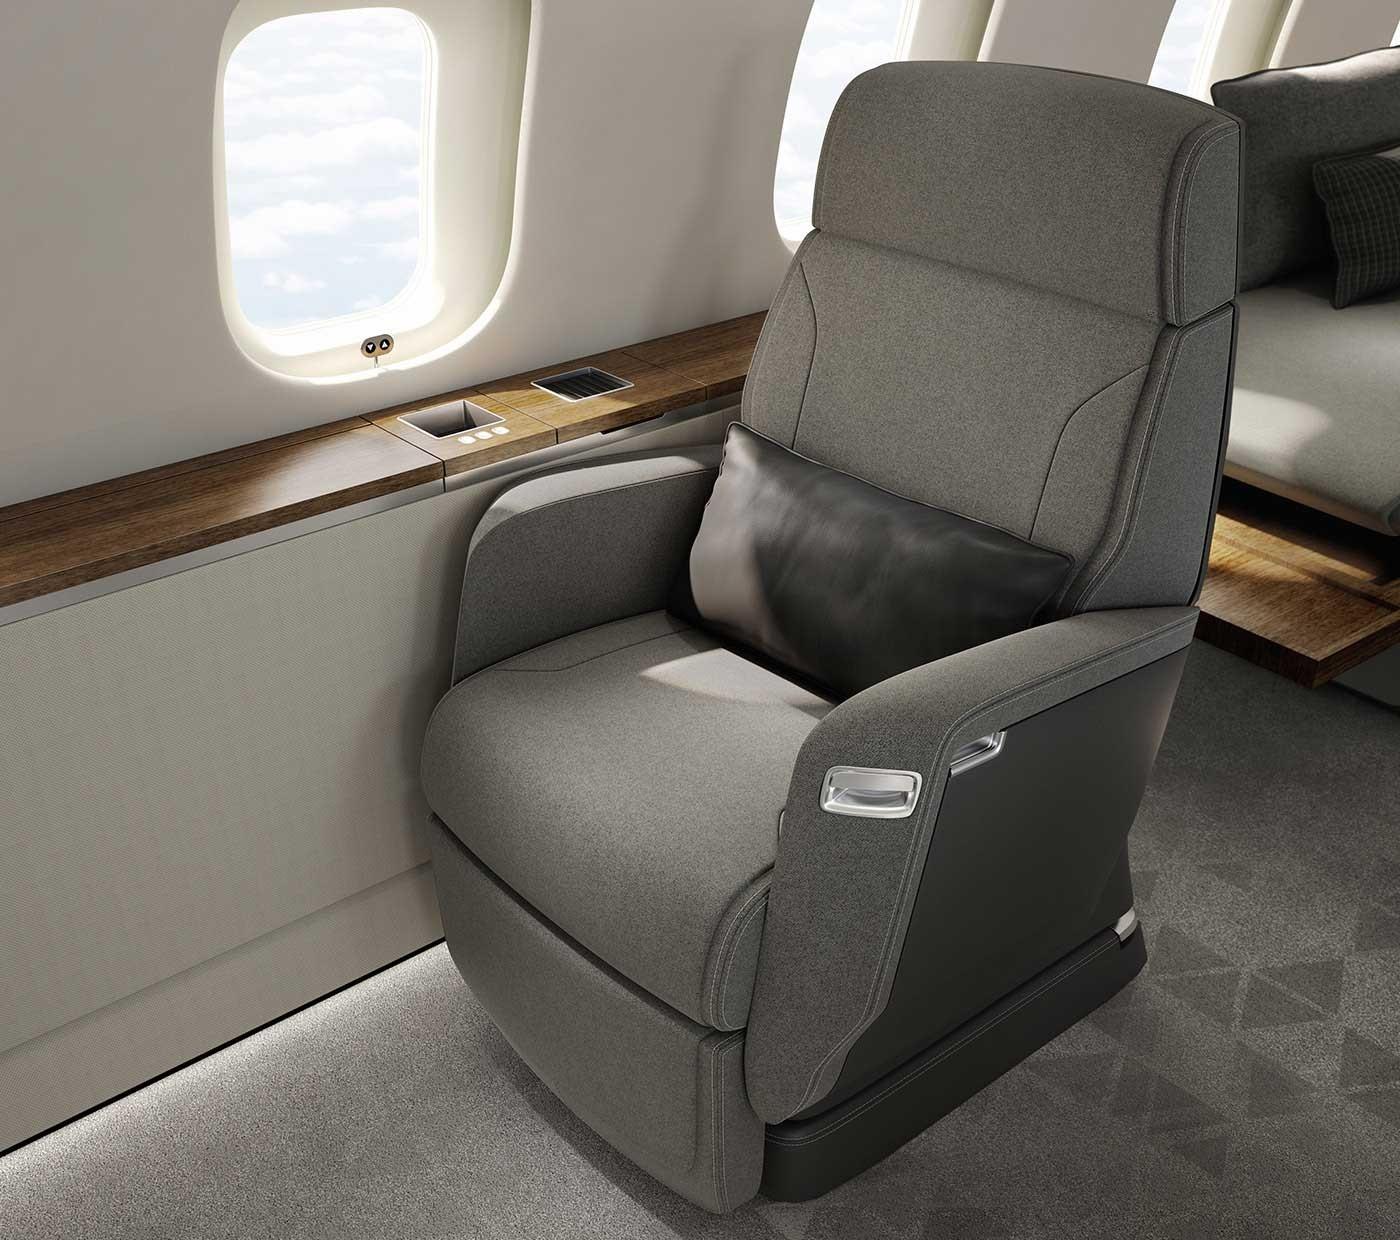 Global 5500 Nuage seat